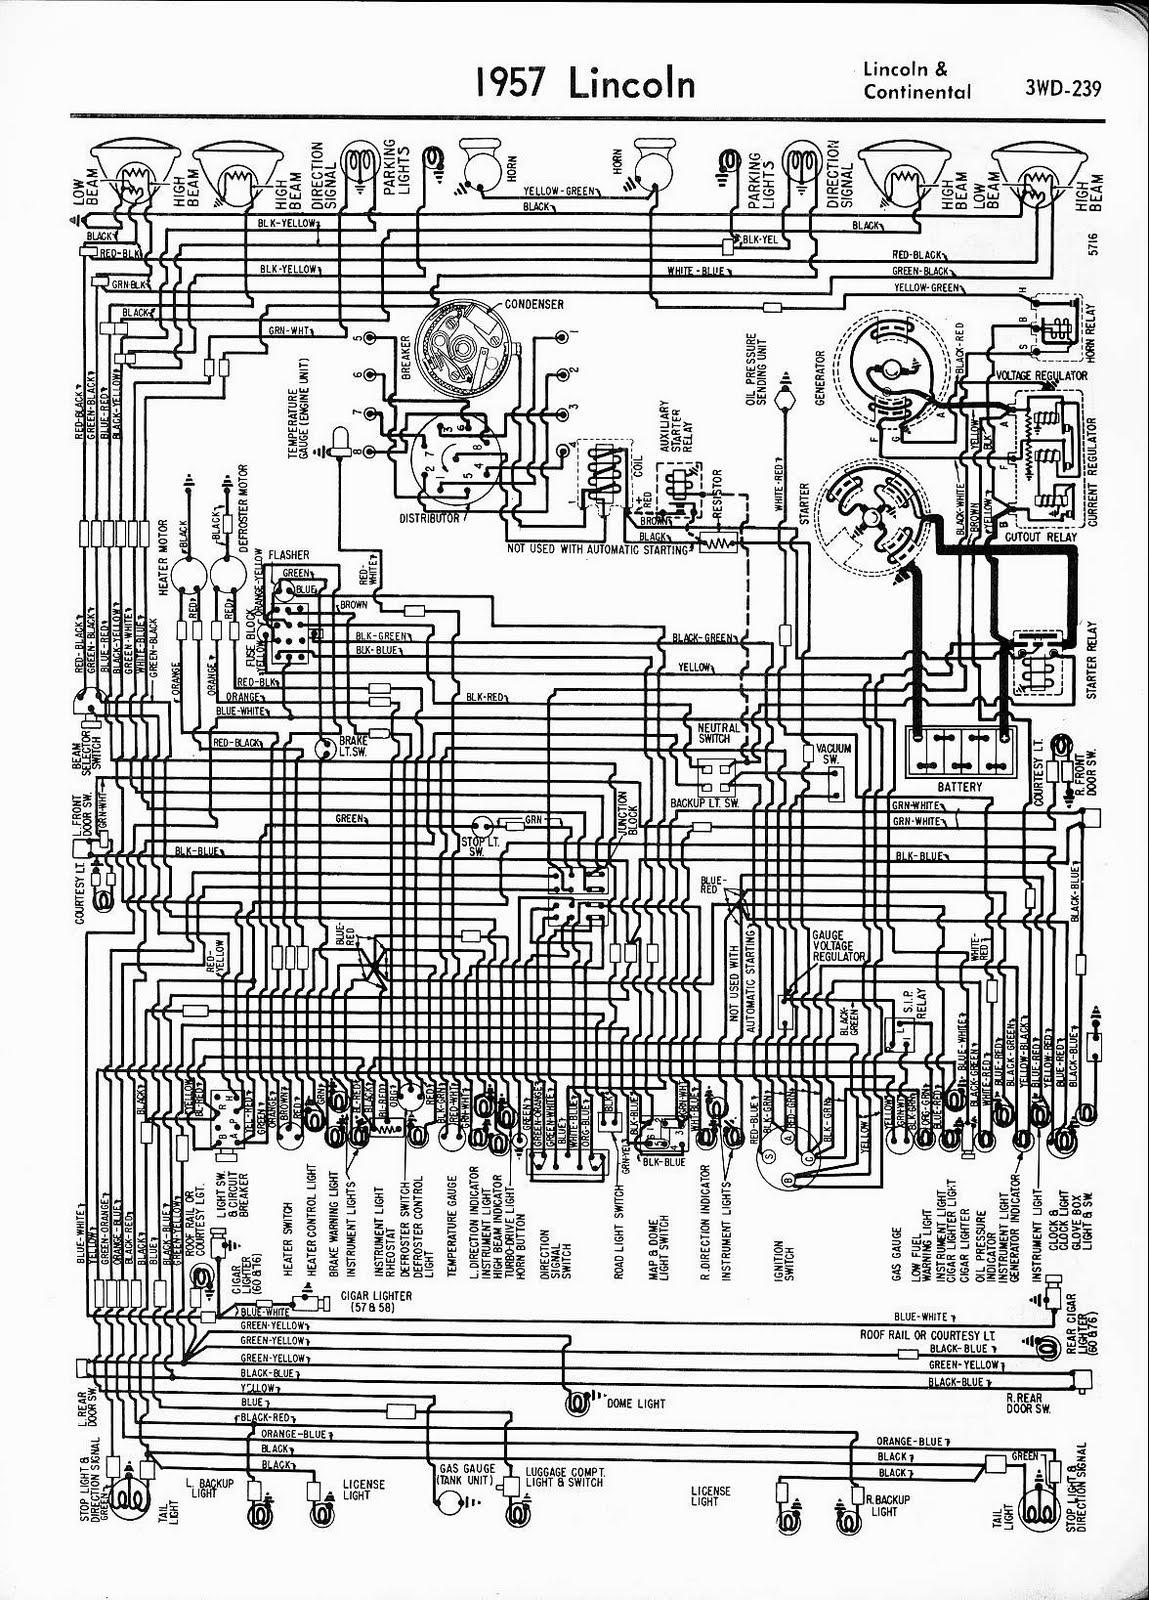 Free Auto Wiring Diagram: 1957 Lincoln Continental Diagram